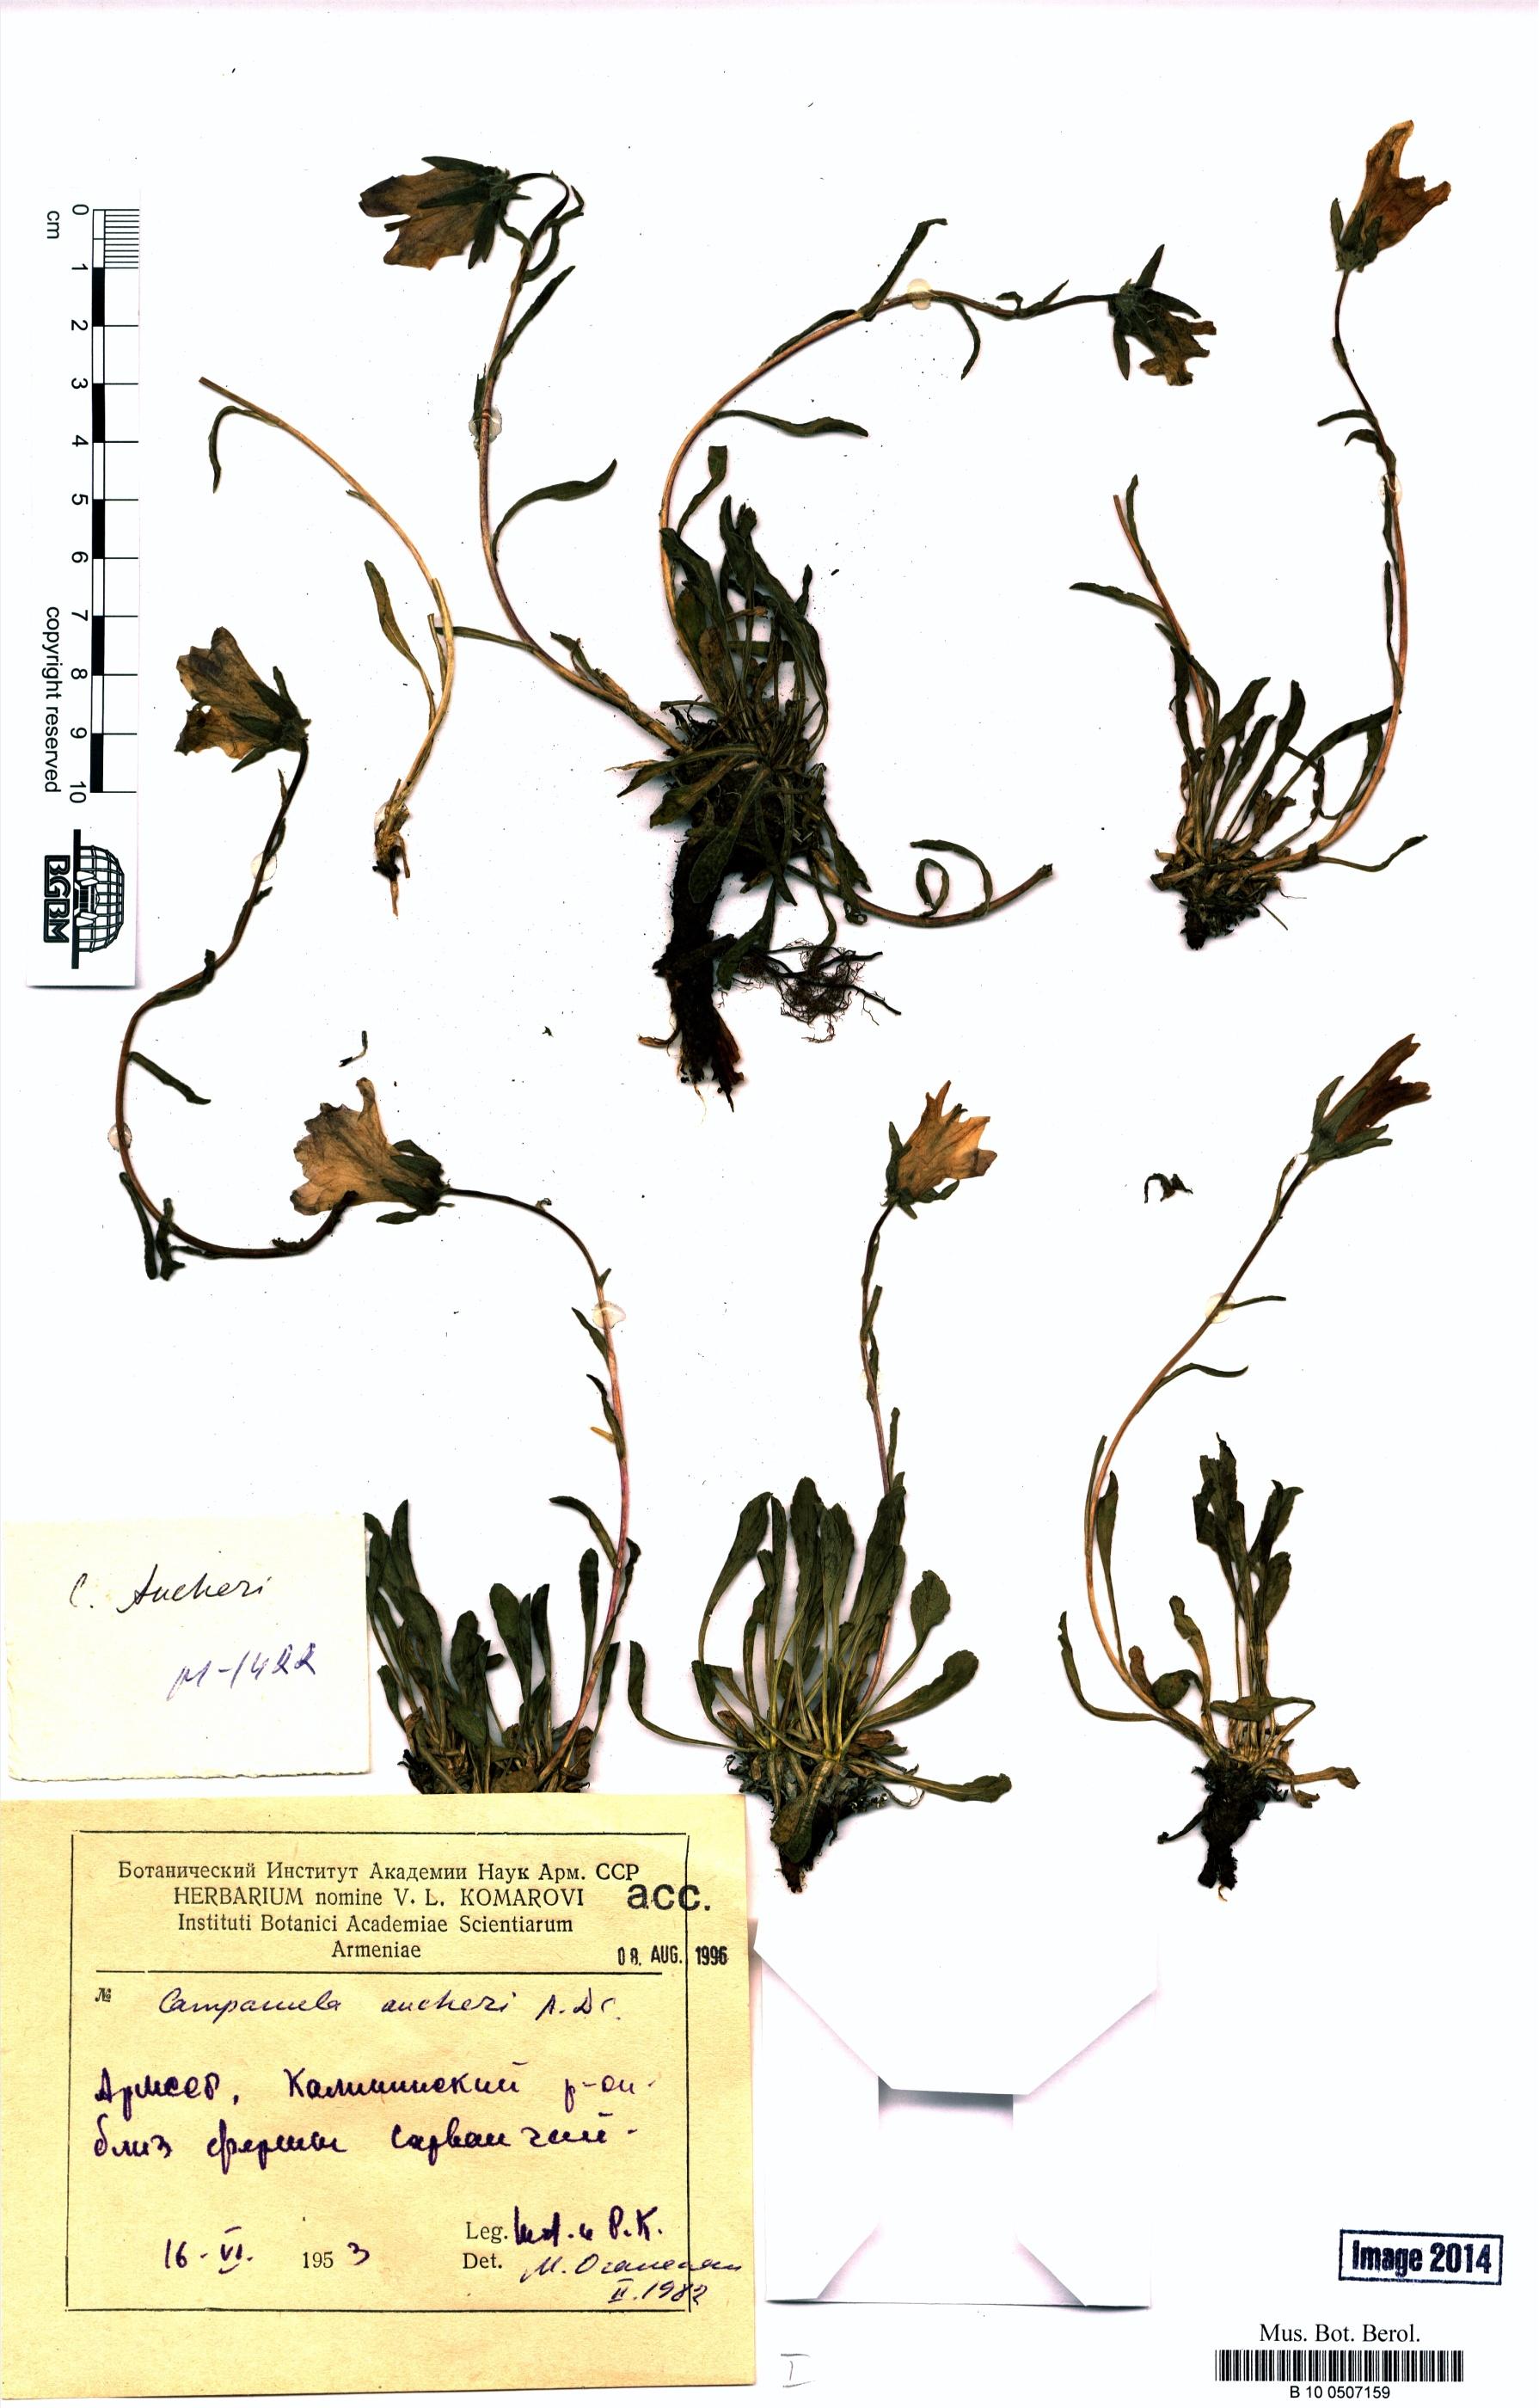 http://ww2.bgbm.org/herbarium/images/B/10/05/07/15/B_10_0507159.jpg